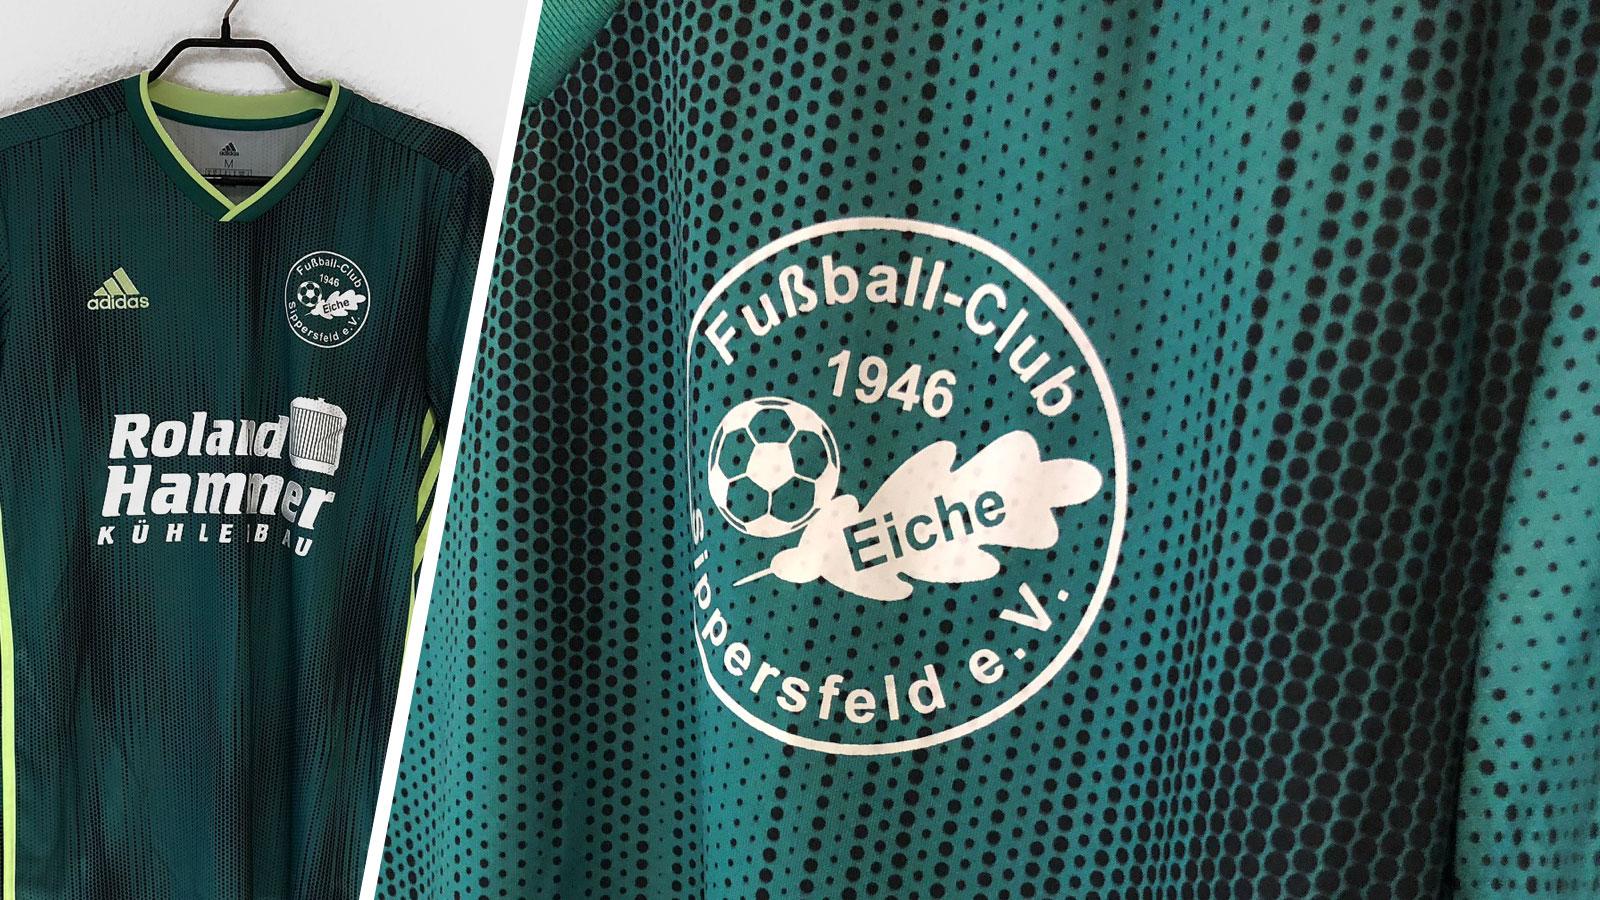 adidas Präsentationsjacke mit farbiger Werbung (TSV Lohe